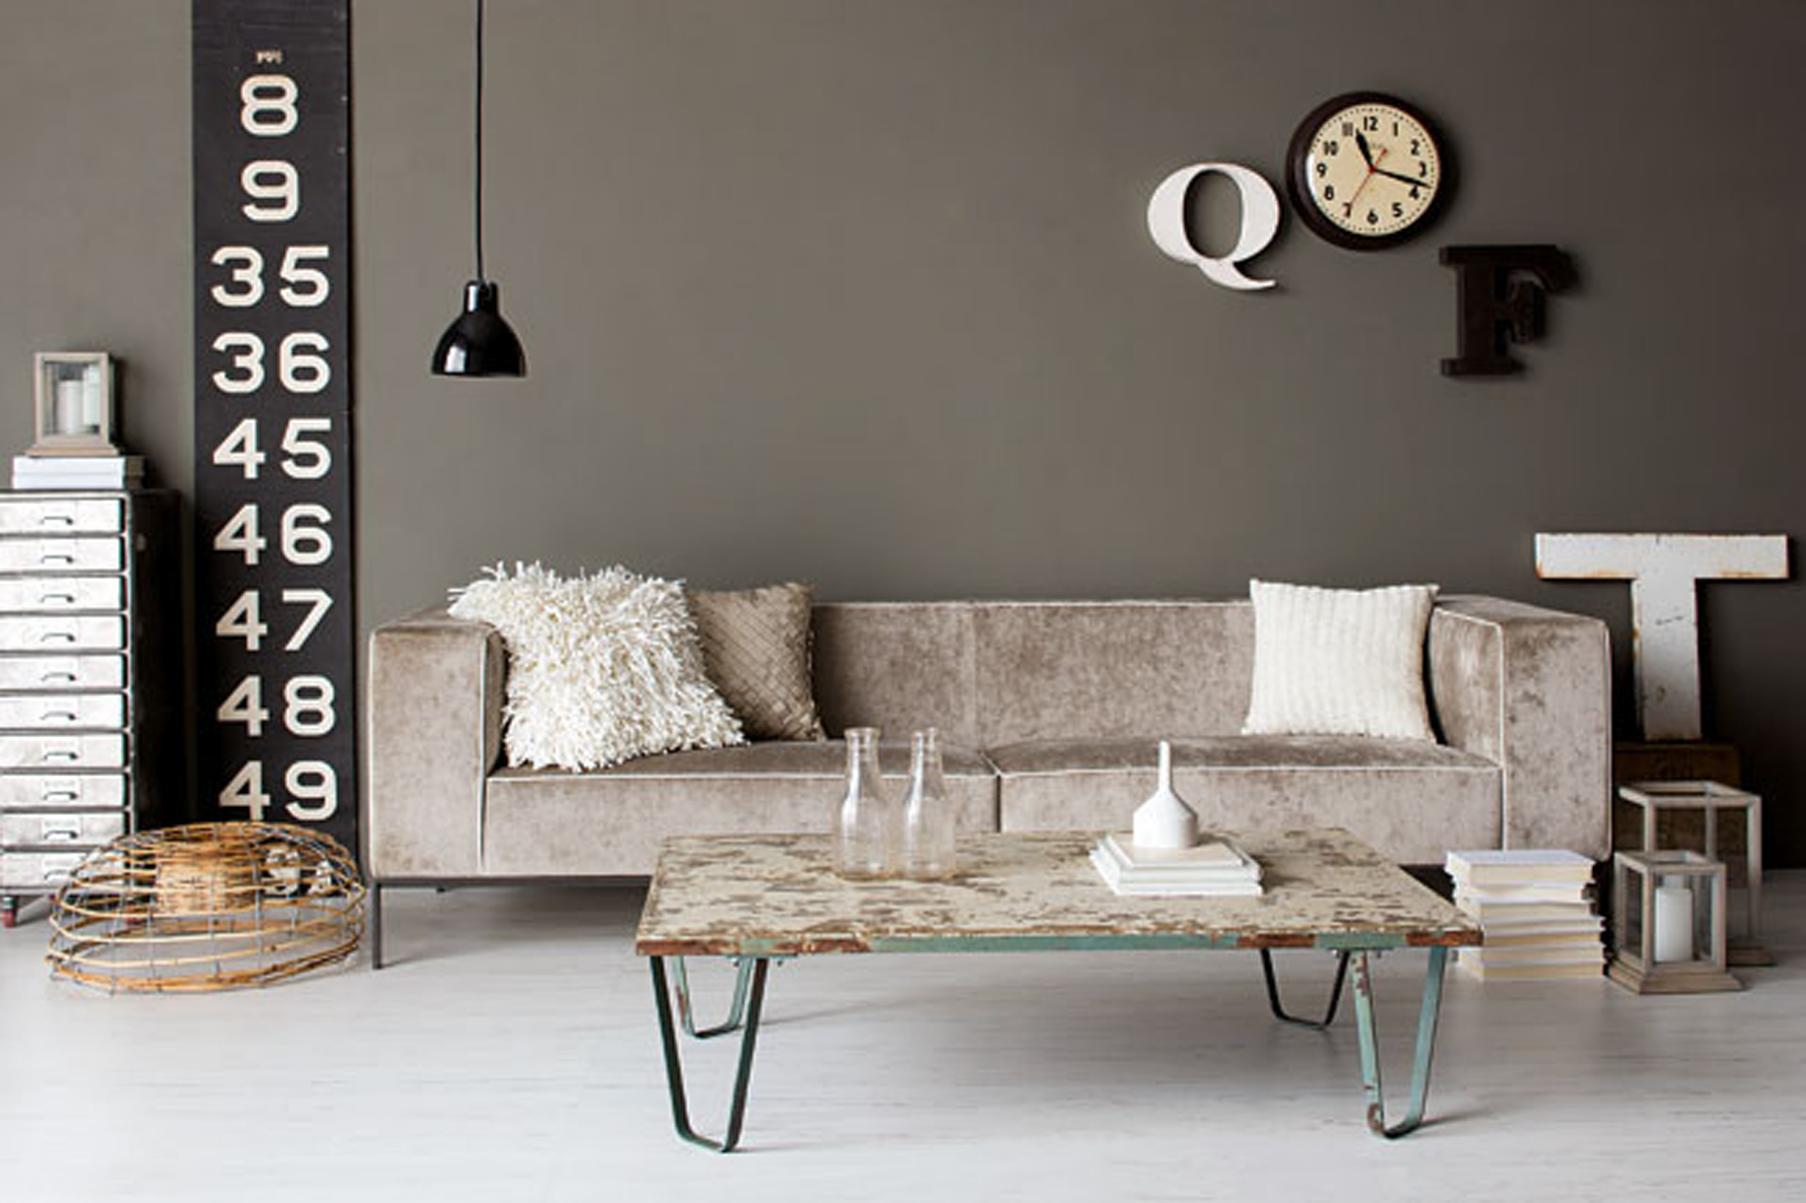 conjunto-letras-decoracion - #industrial #eclectic. #InteriorDesign. |  Amber's Loft | Pinterest | Big letters, Industrial and House interior design